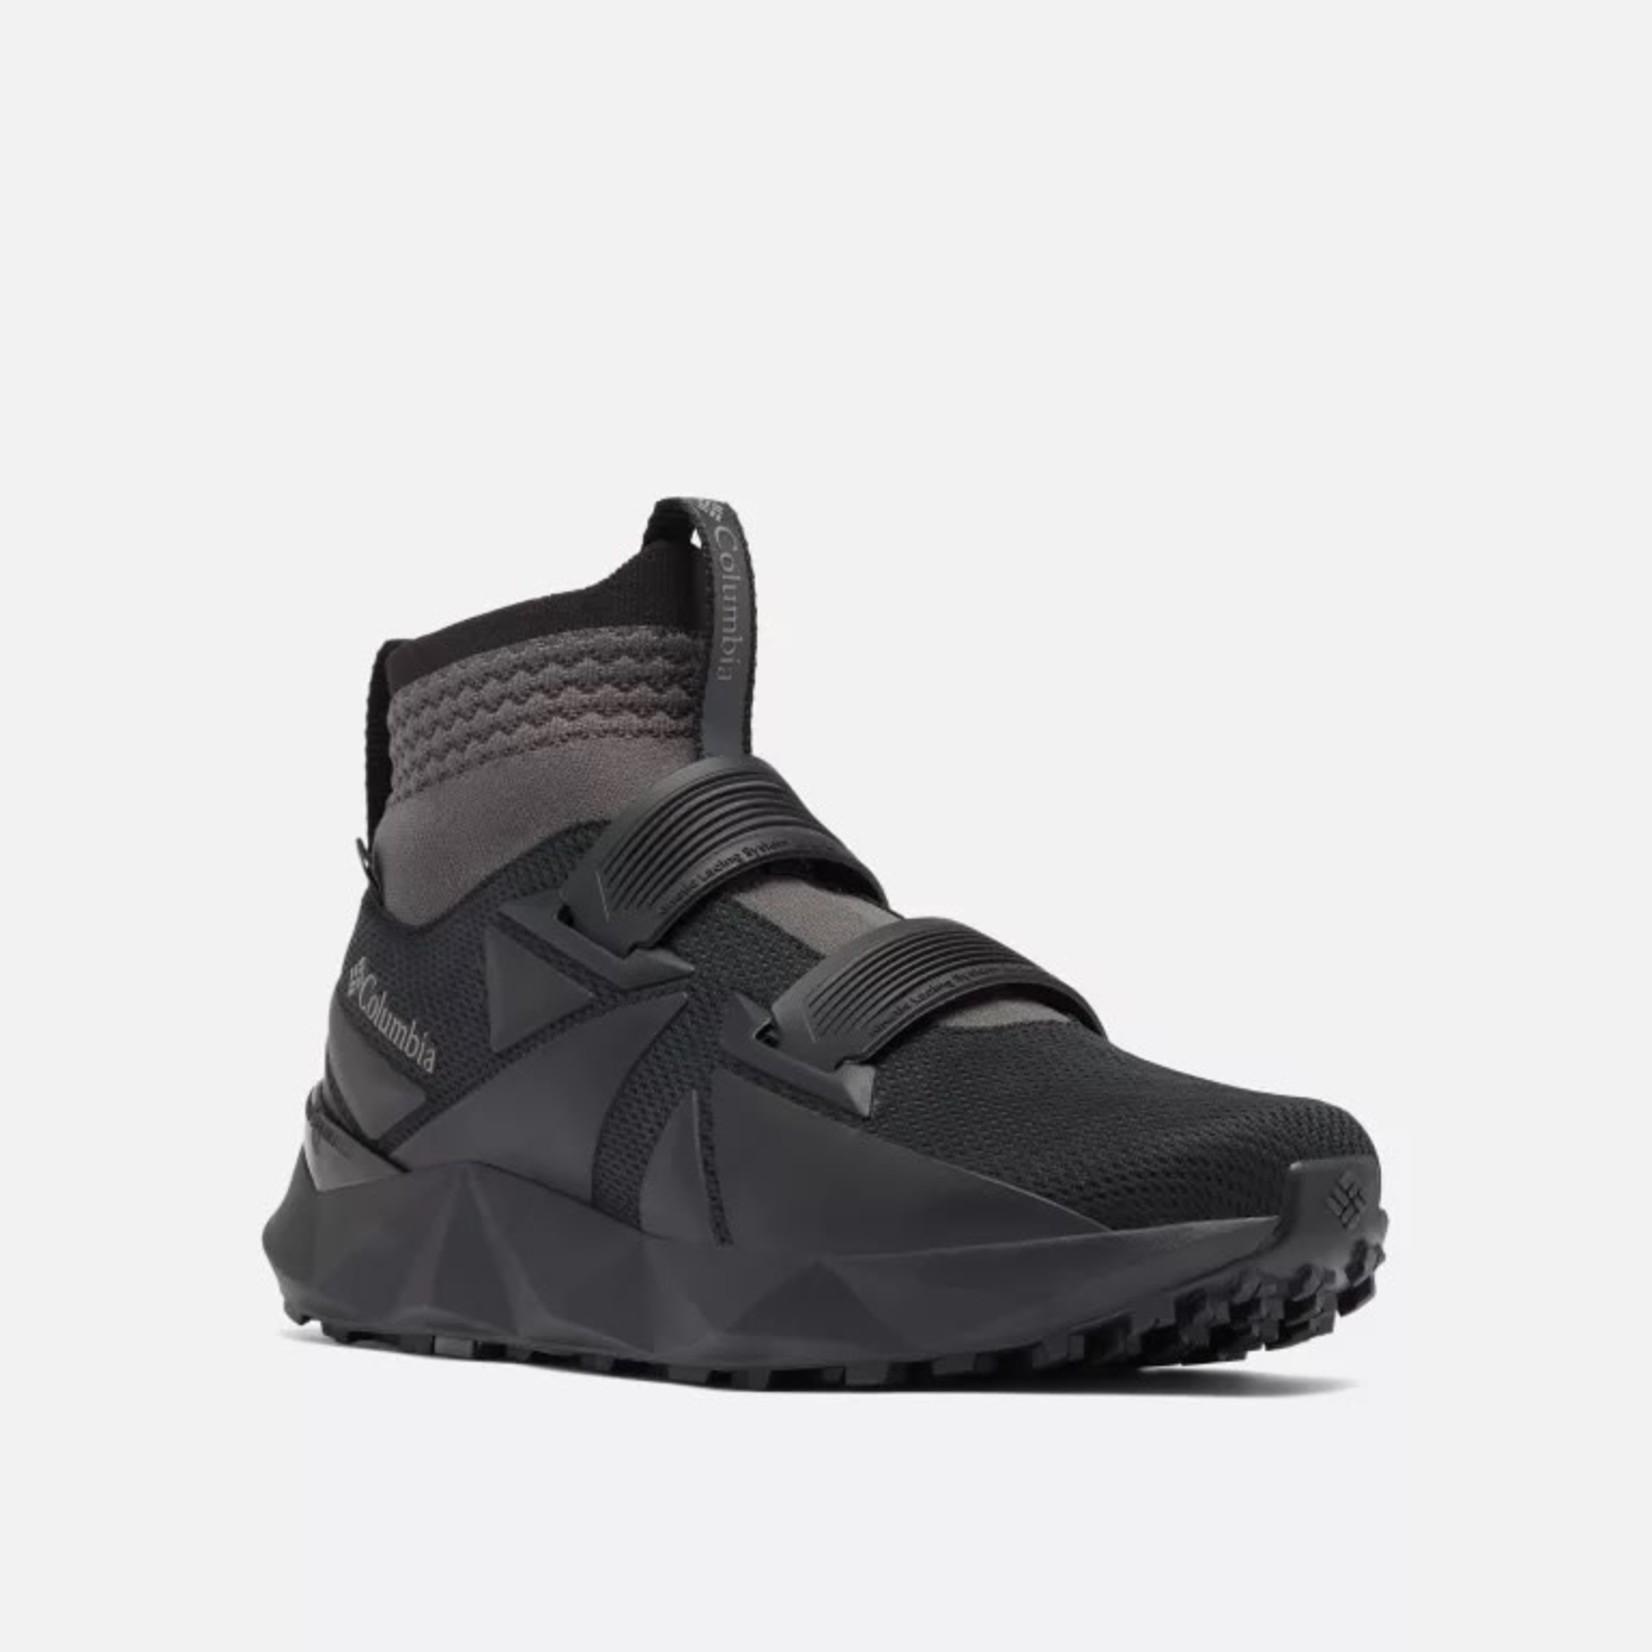 Columbia Columbia : Facet 45 Outdry Men Winter Shoes